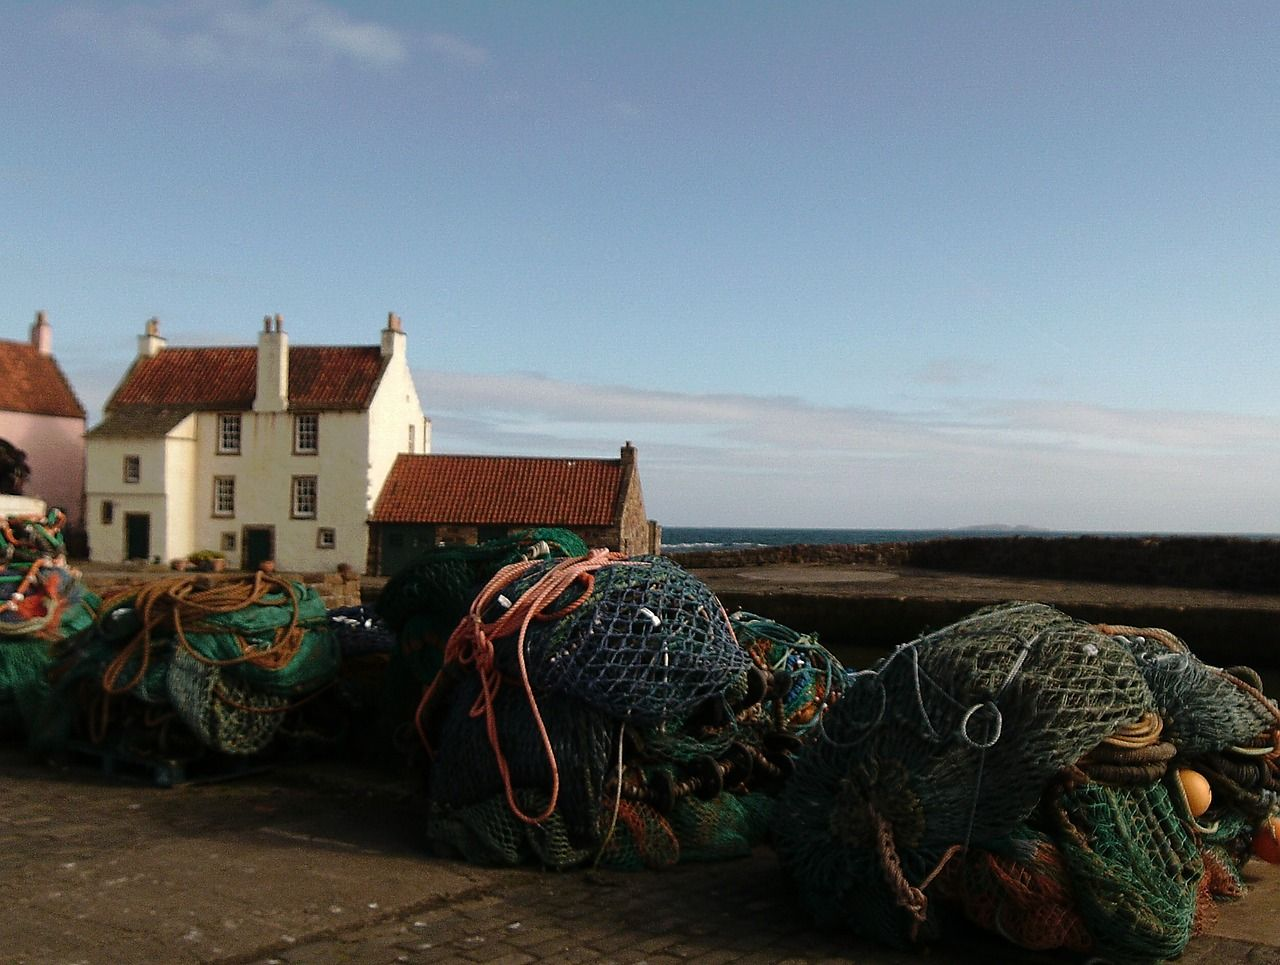 pittenweem, East Neuk of Fife - villaggi dei pescatori scozia